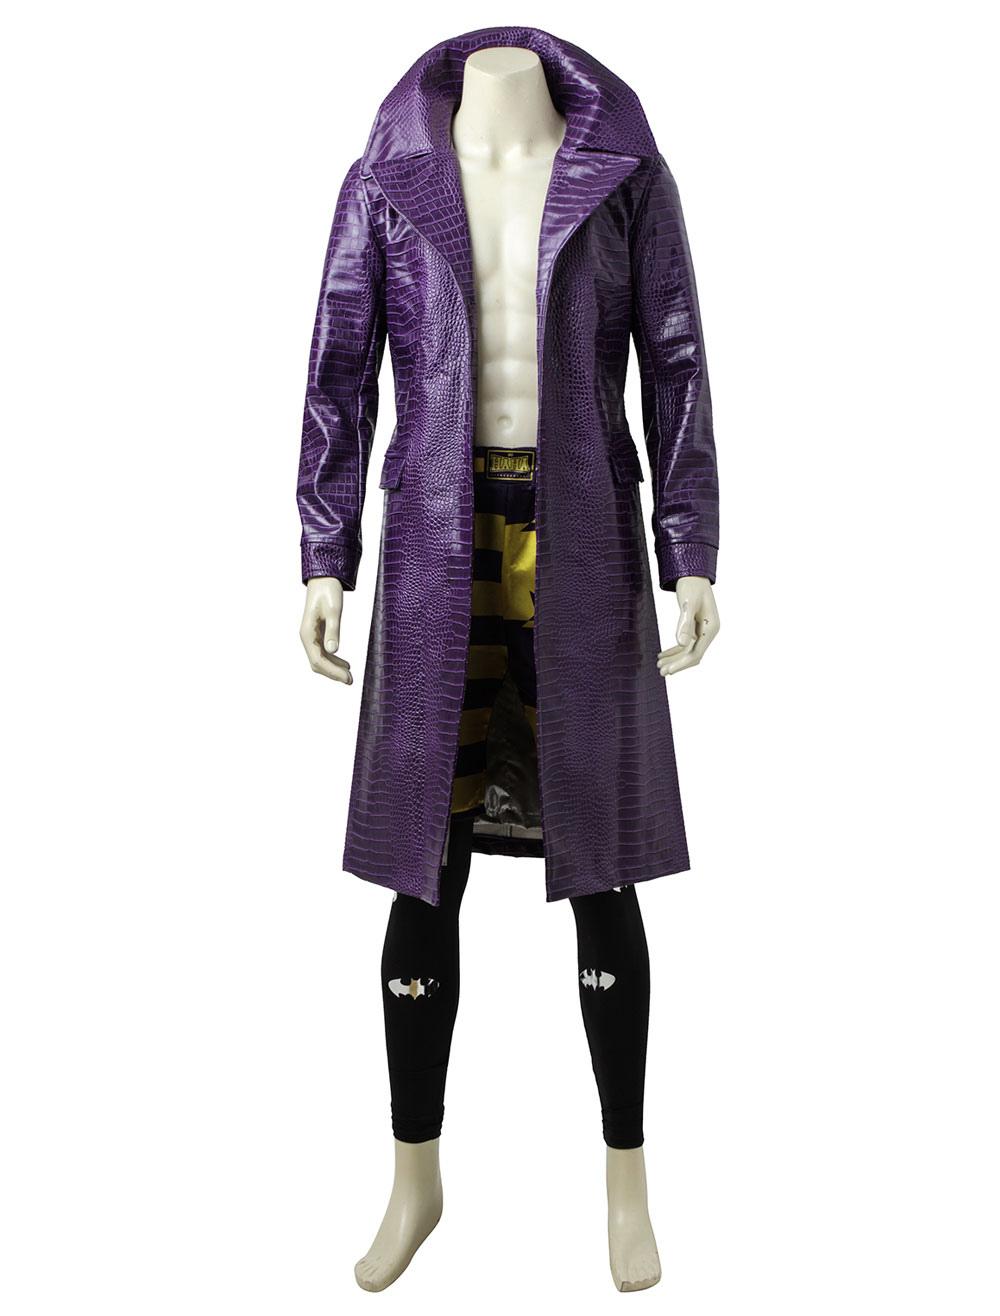 814783ea4 DC Comics Suicide Squad Joker Cosplay Faux Leather Jacket Only Overcoat  Halloween